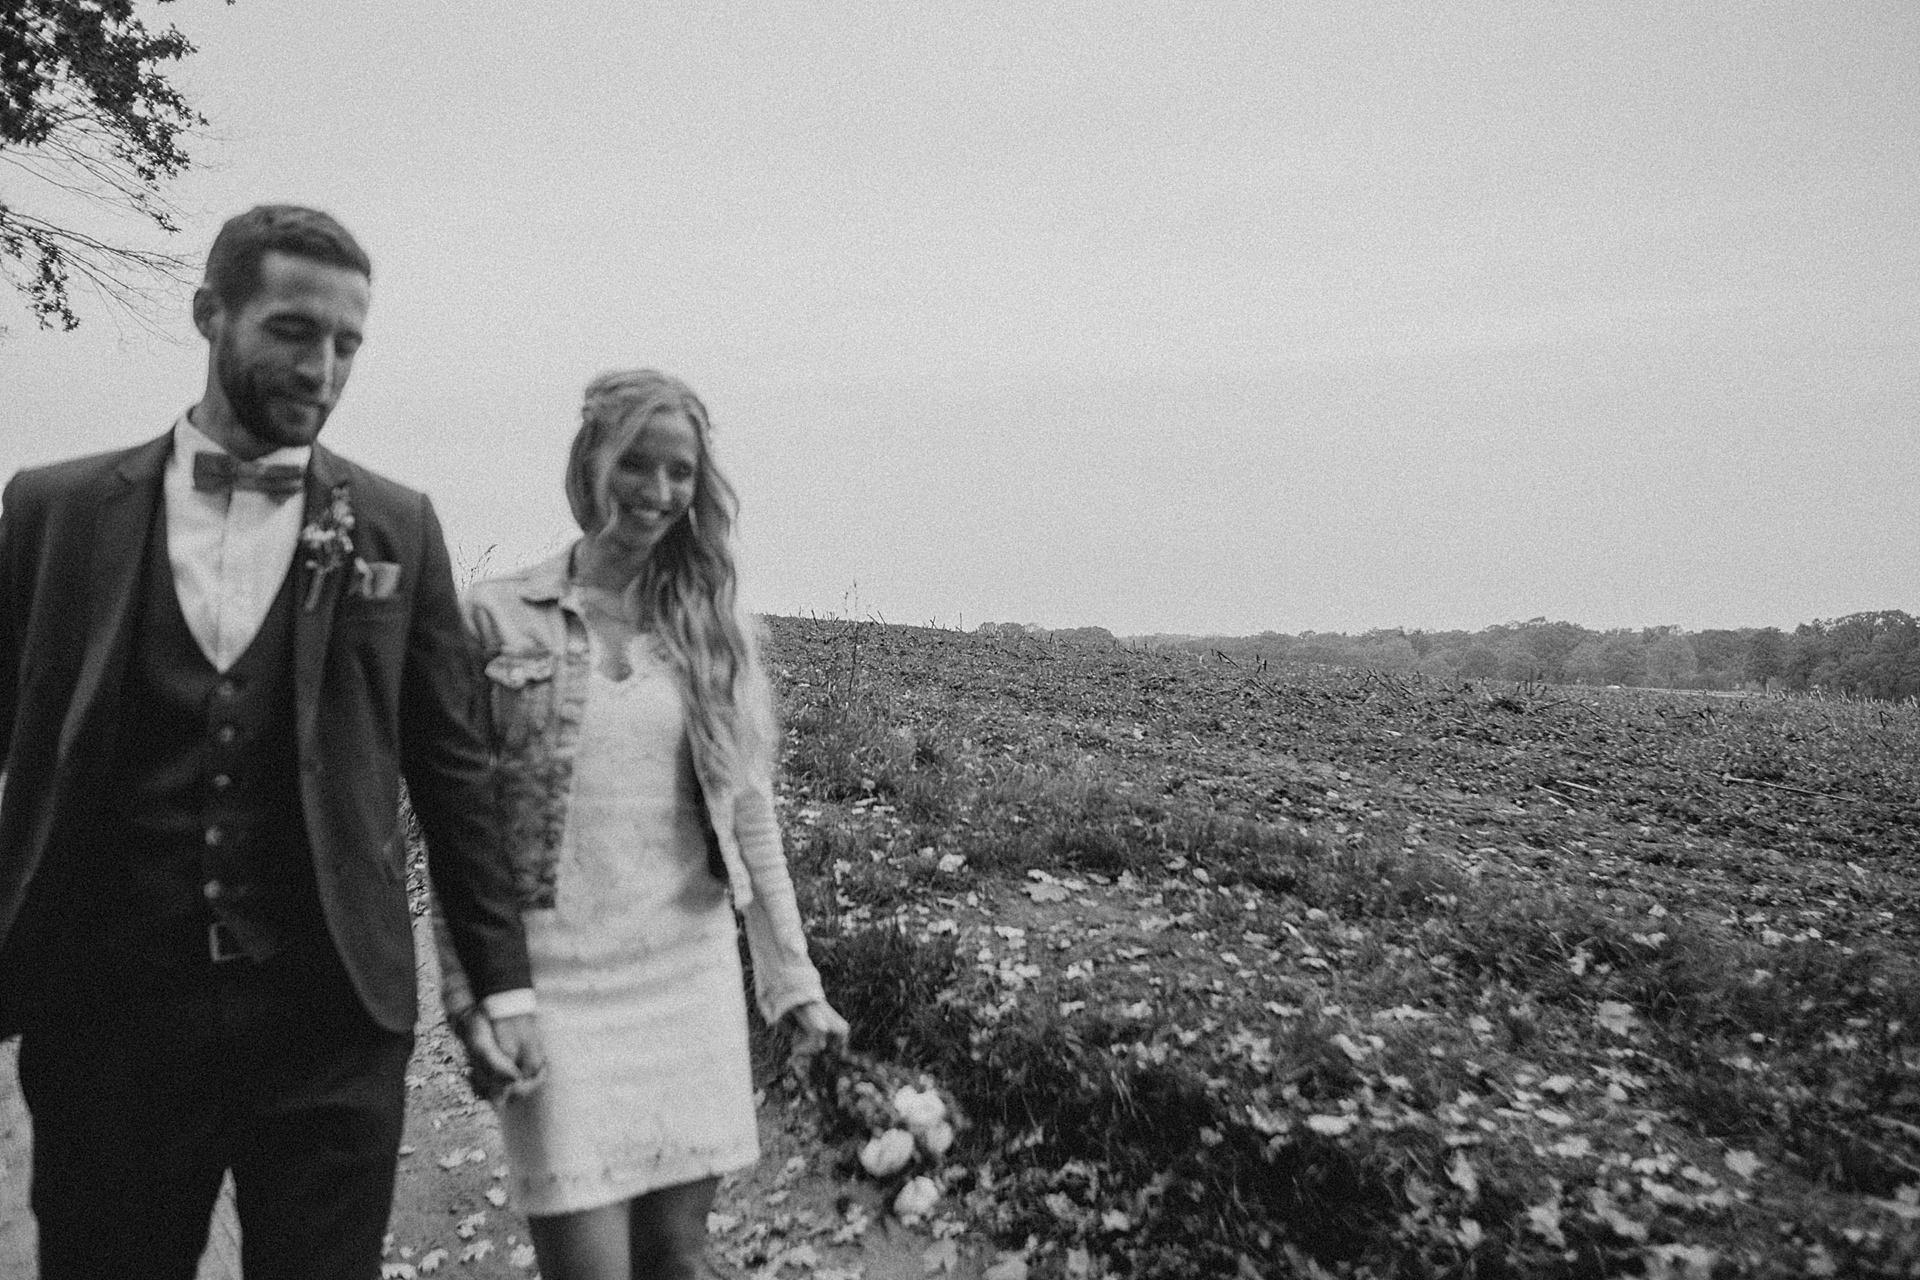 Hochzeitsfotograf Bremen | Daniel Zube | echtes  Leben, bleibende Momente